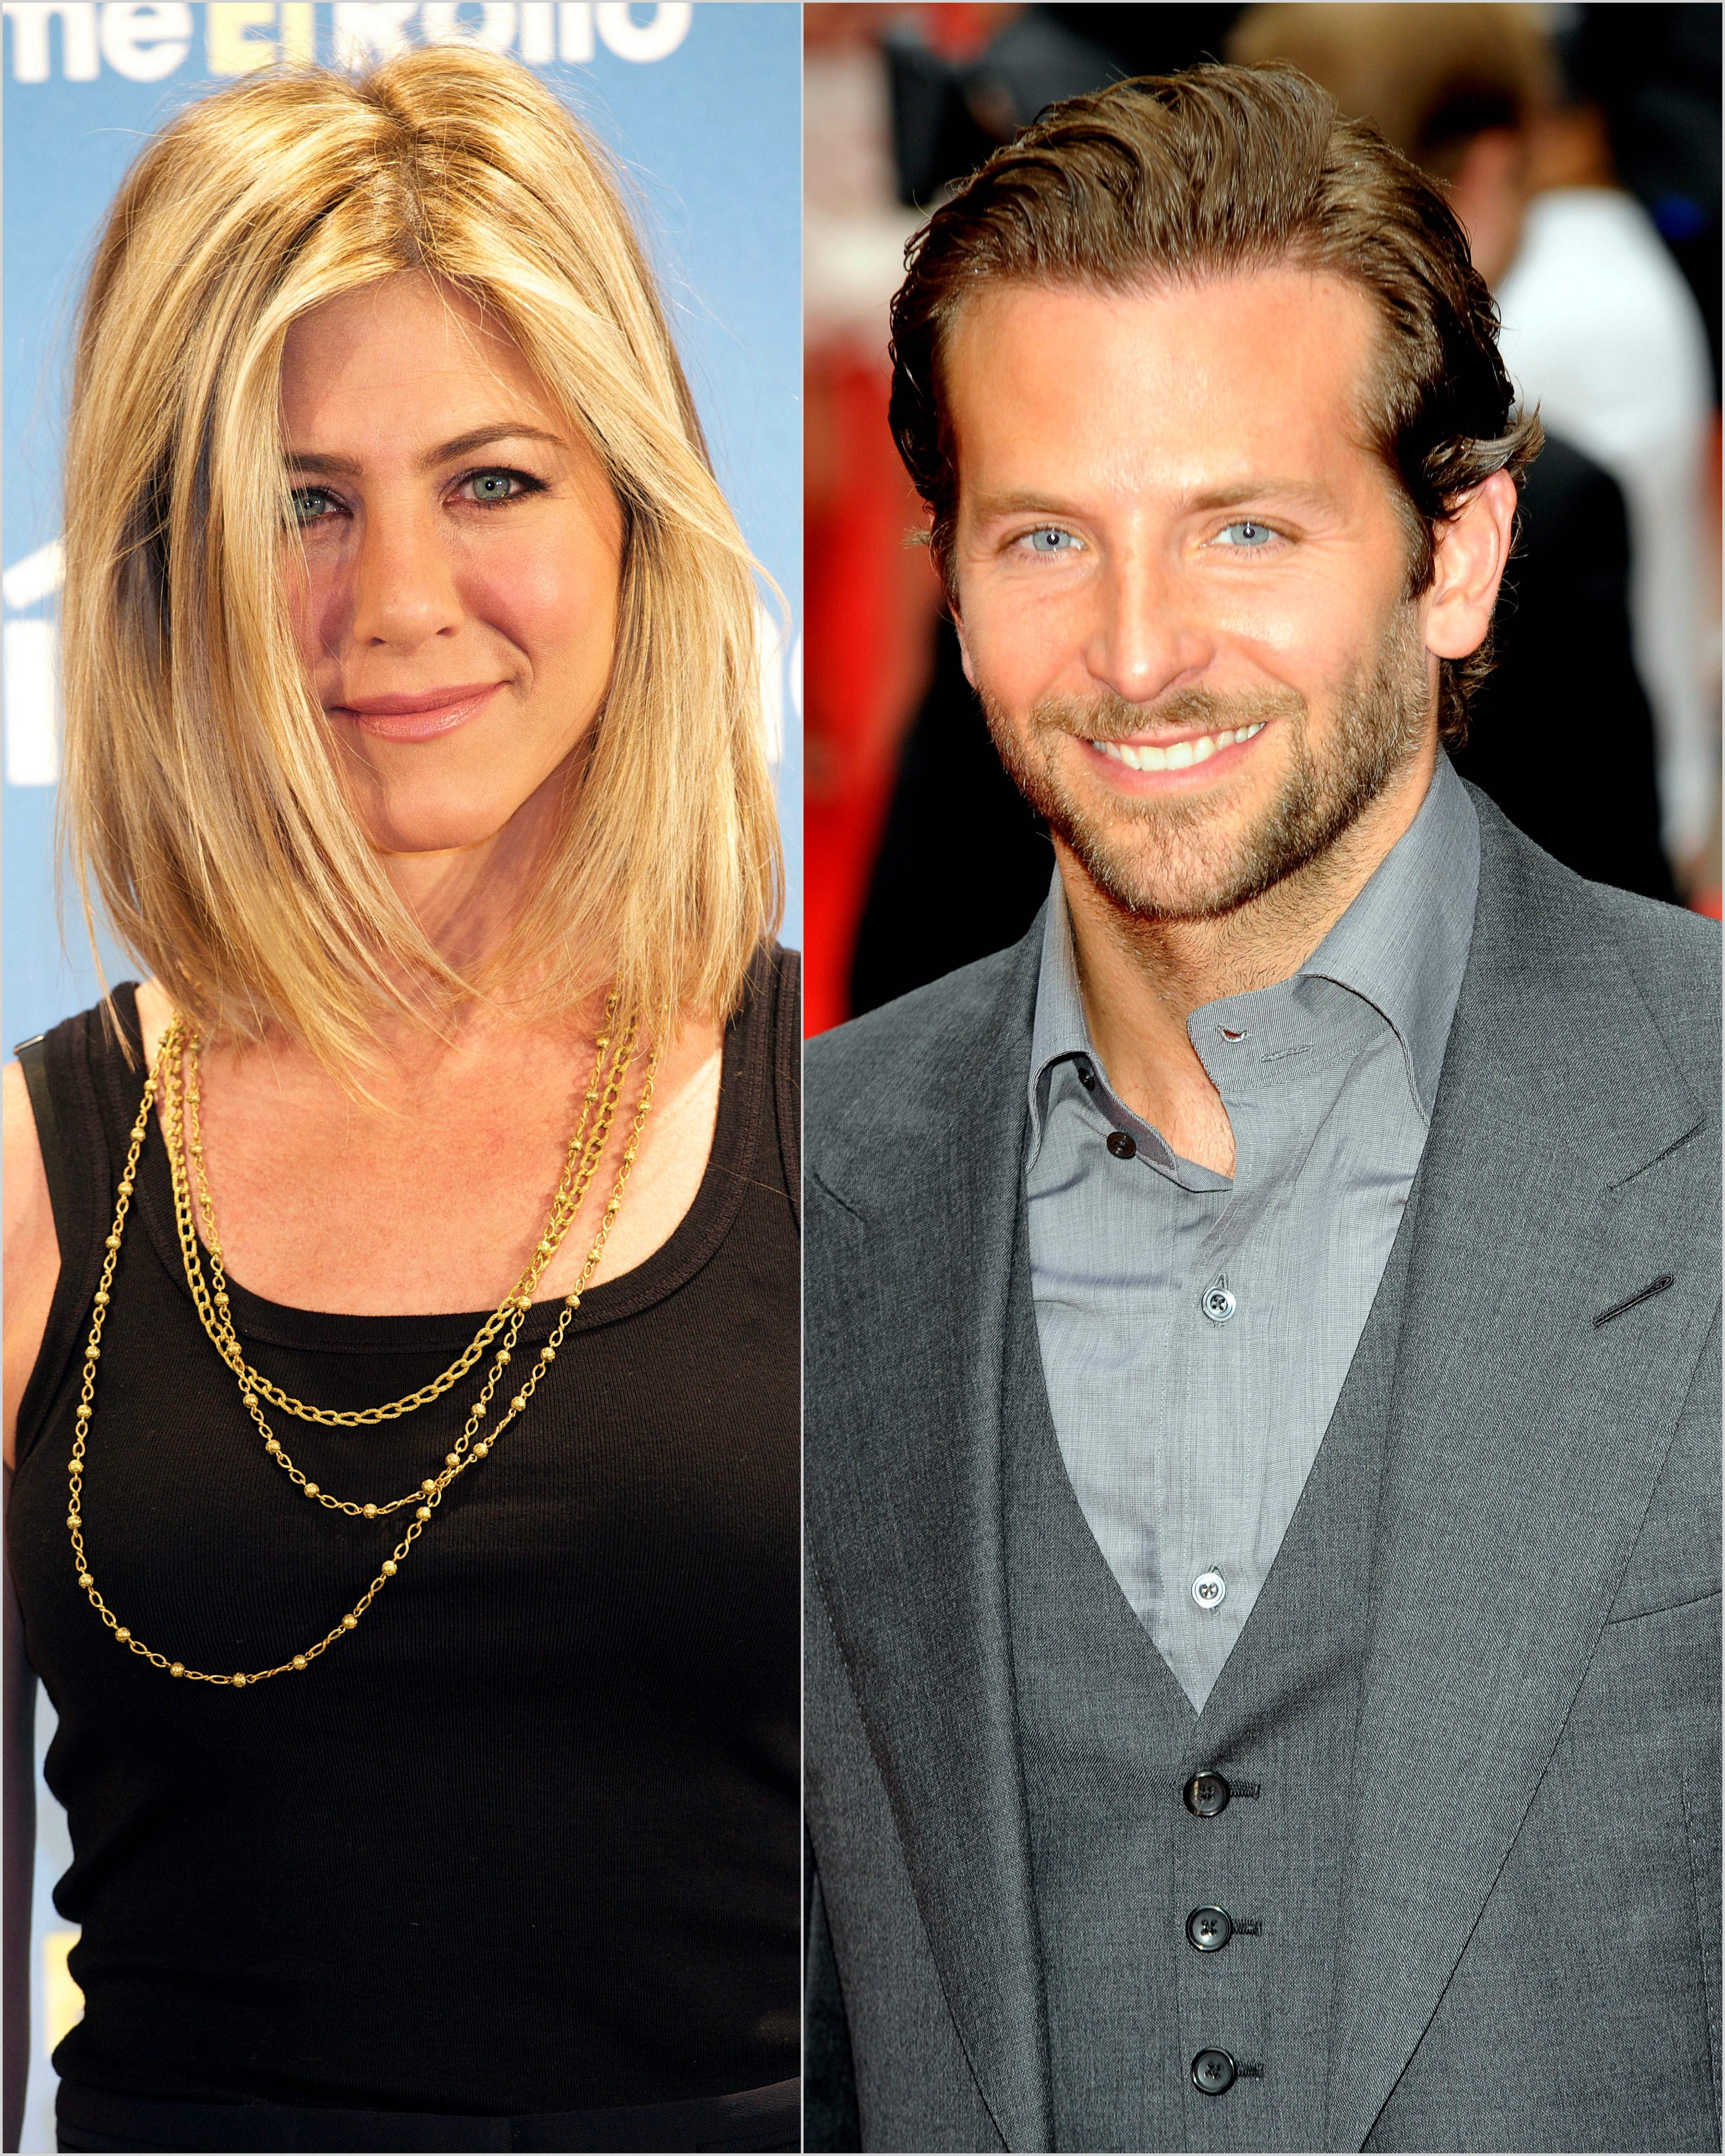 Bradley Cooper and Jennifer Aniston